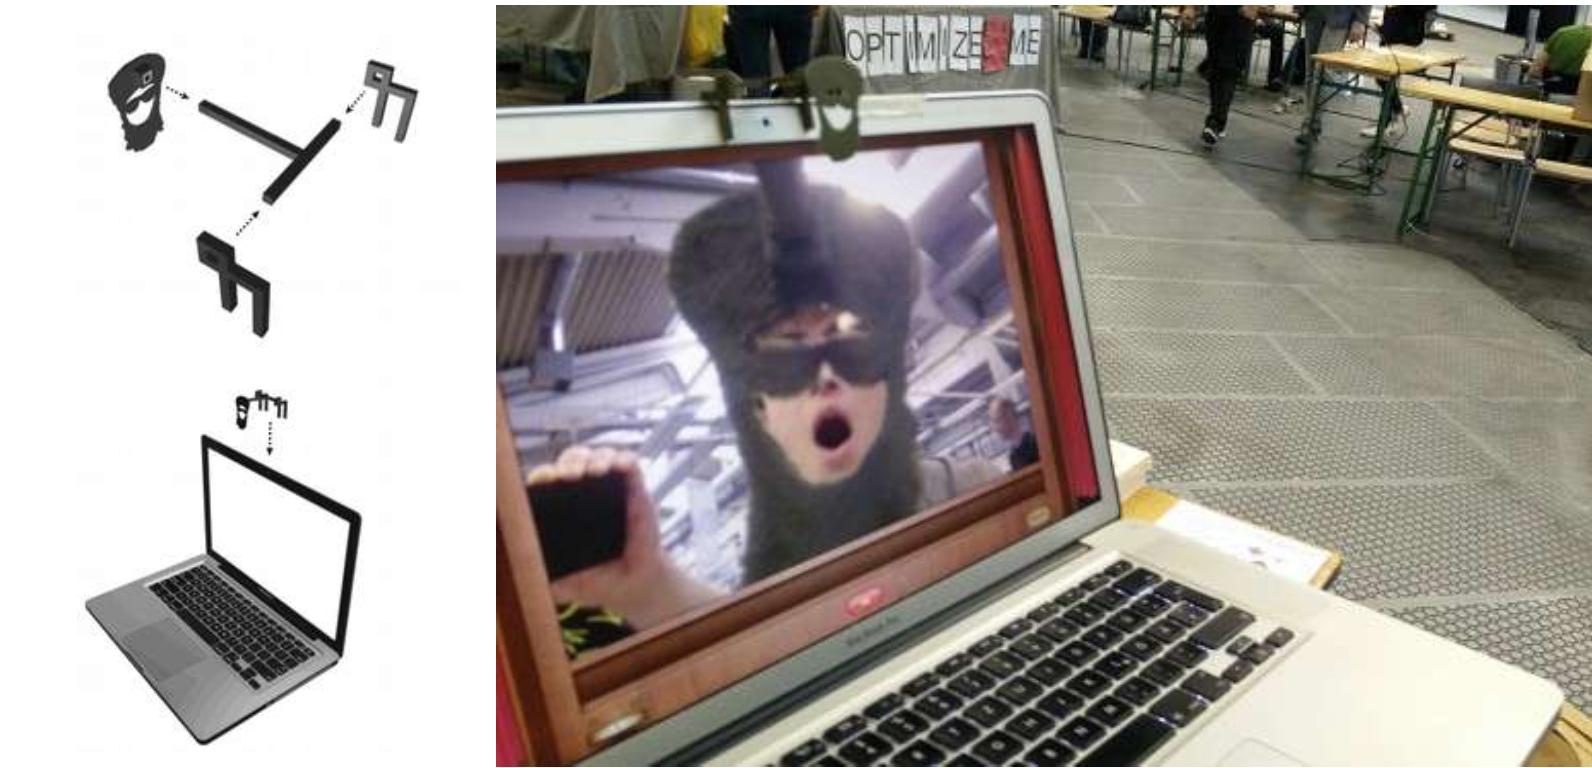 Universal Suspect  Aren't we all a little supicious? (a webcam cover for laptops)